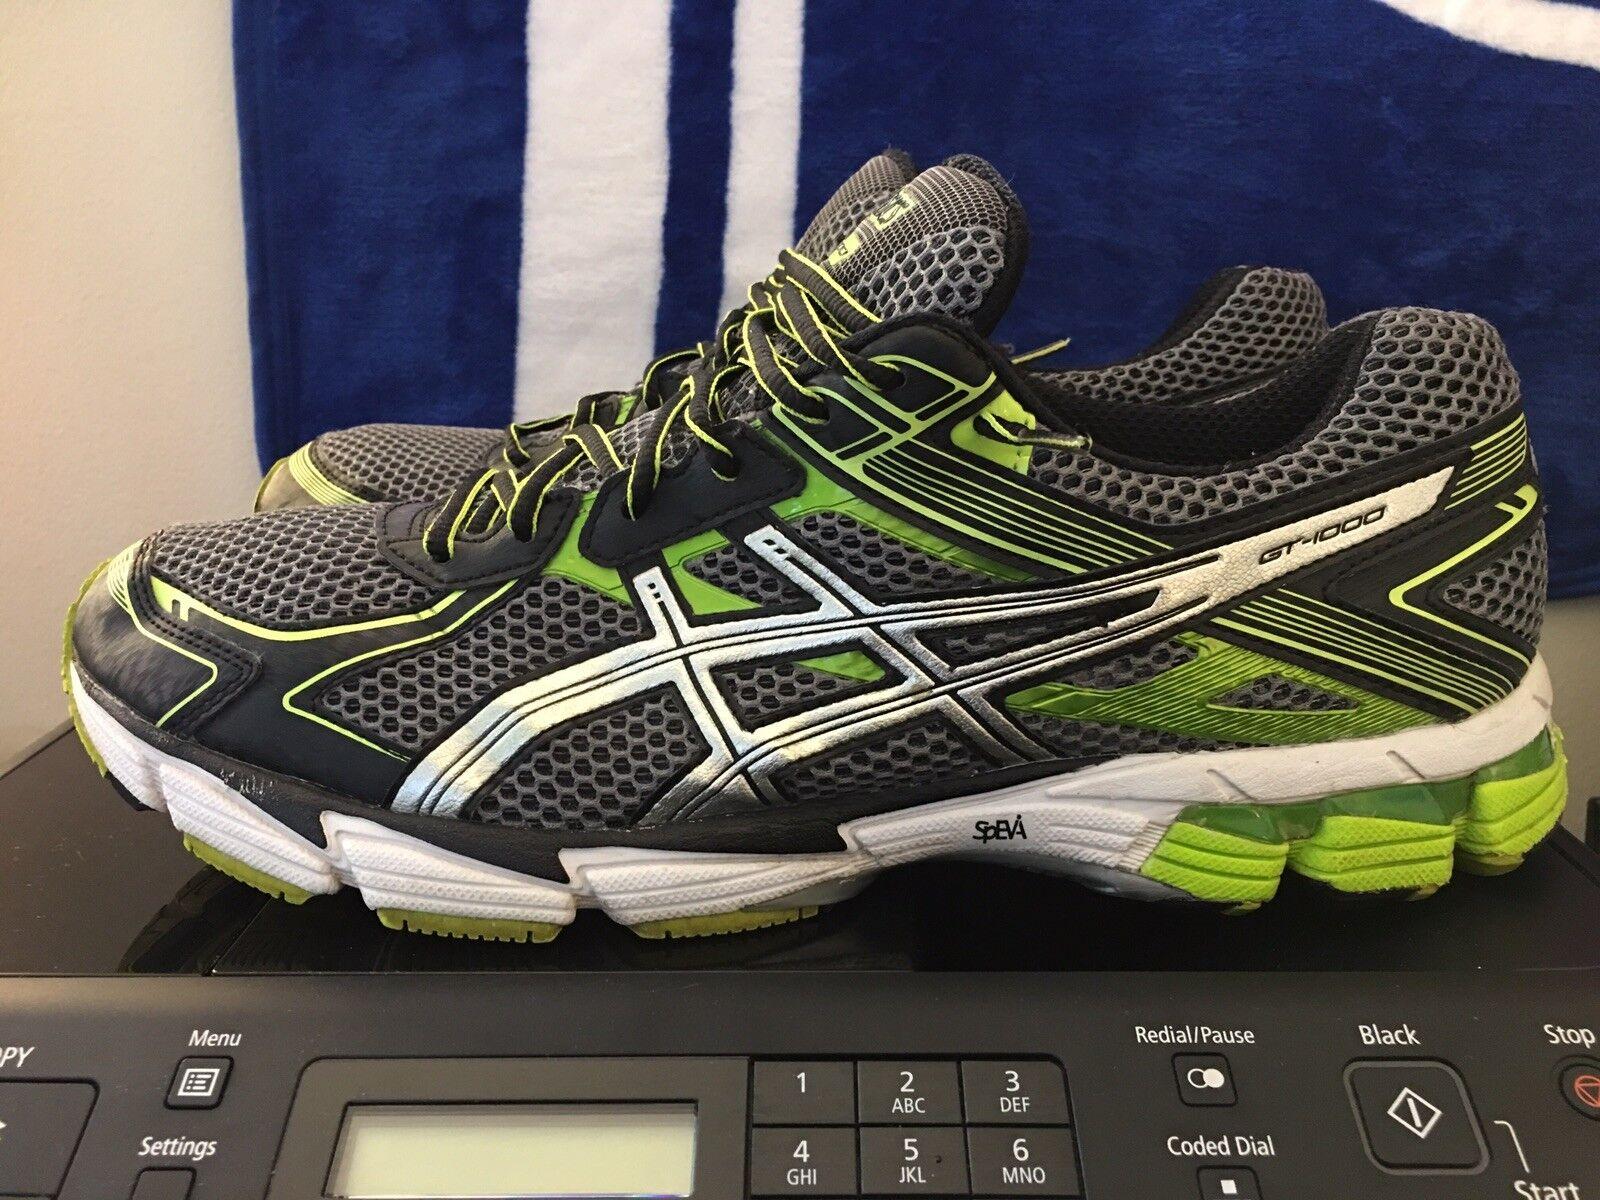 Asics Gel GT-1000, T3R0N, Silver   Black   Green, Men's Running shoes, Size 14